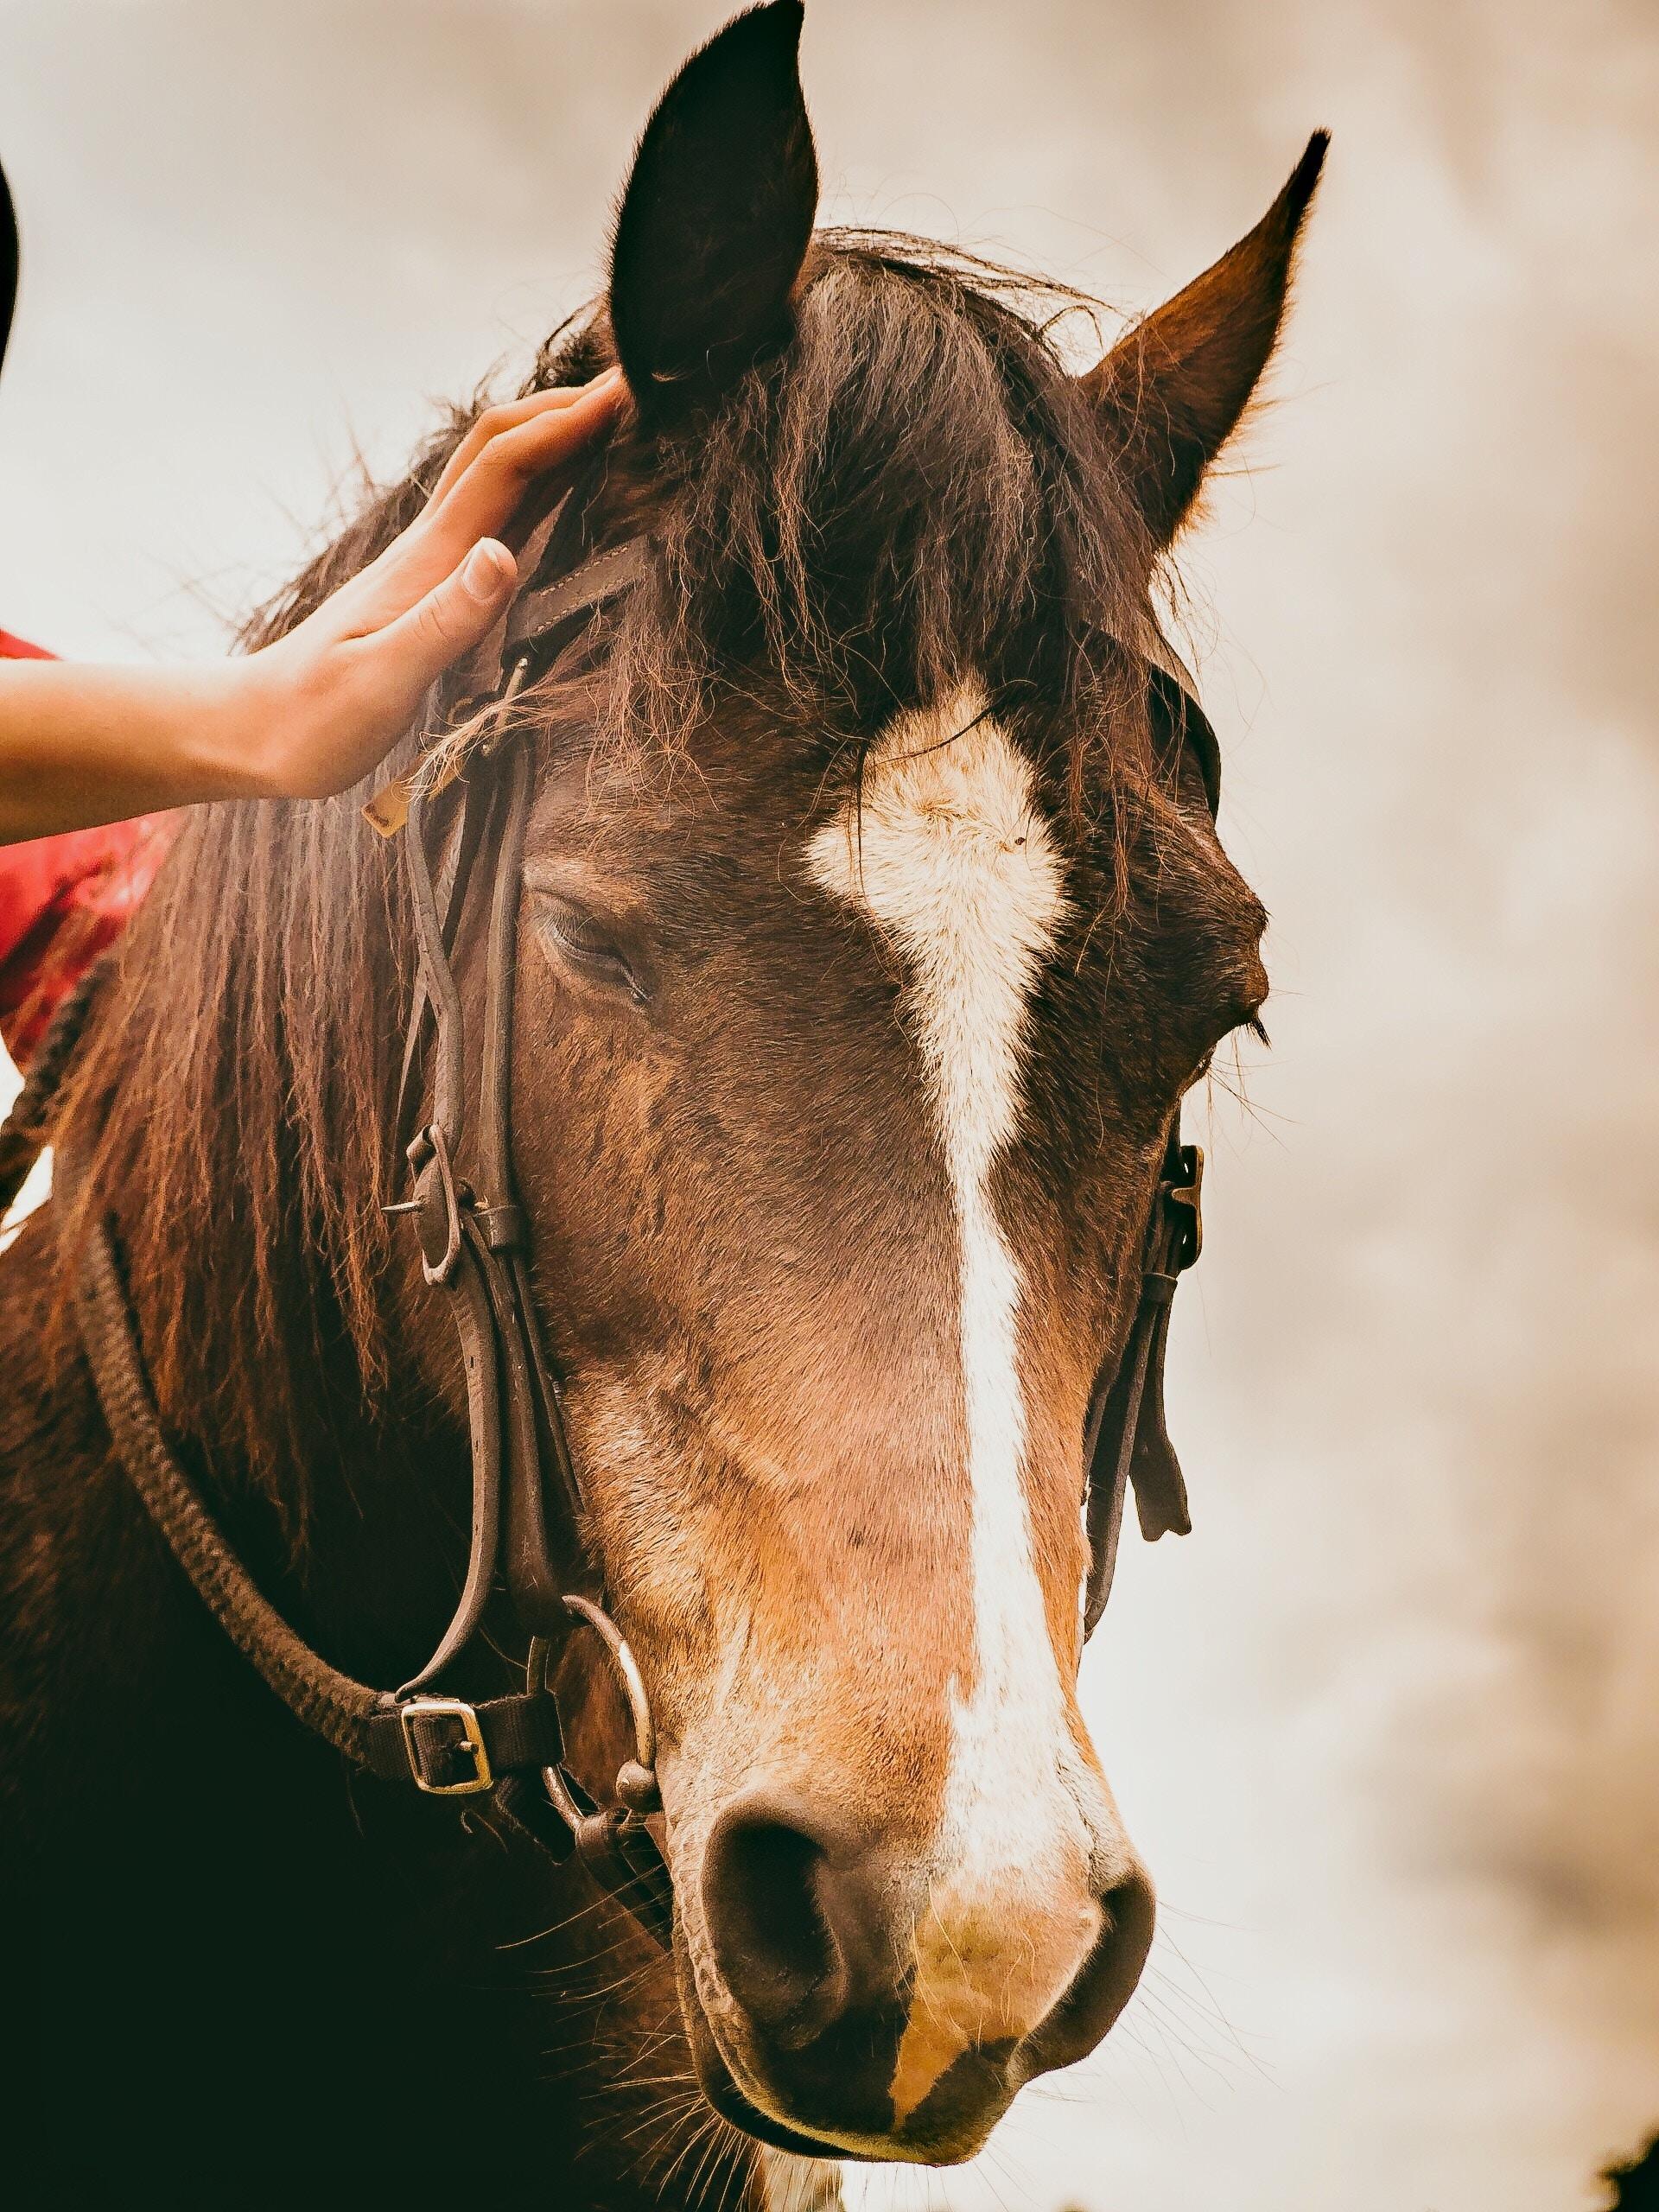 hand touching & scrutinizing horse